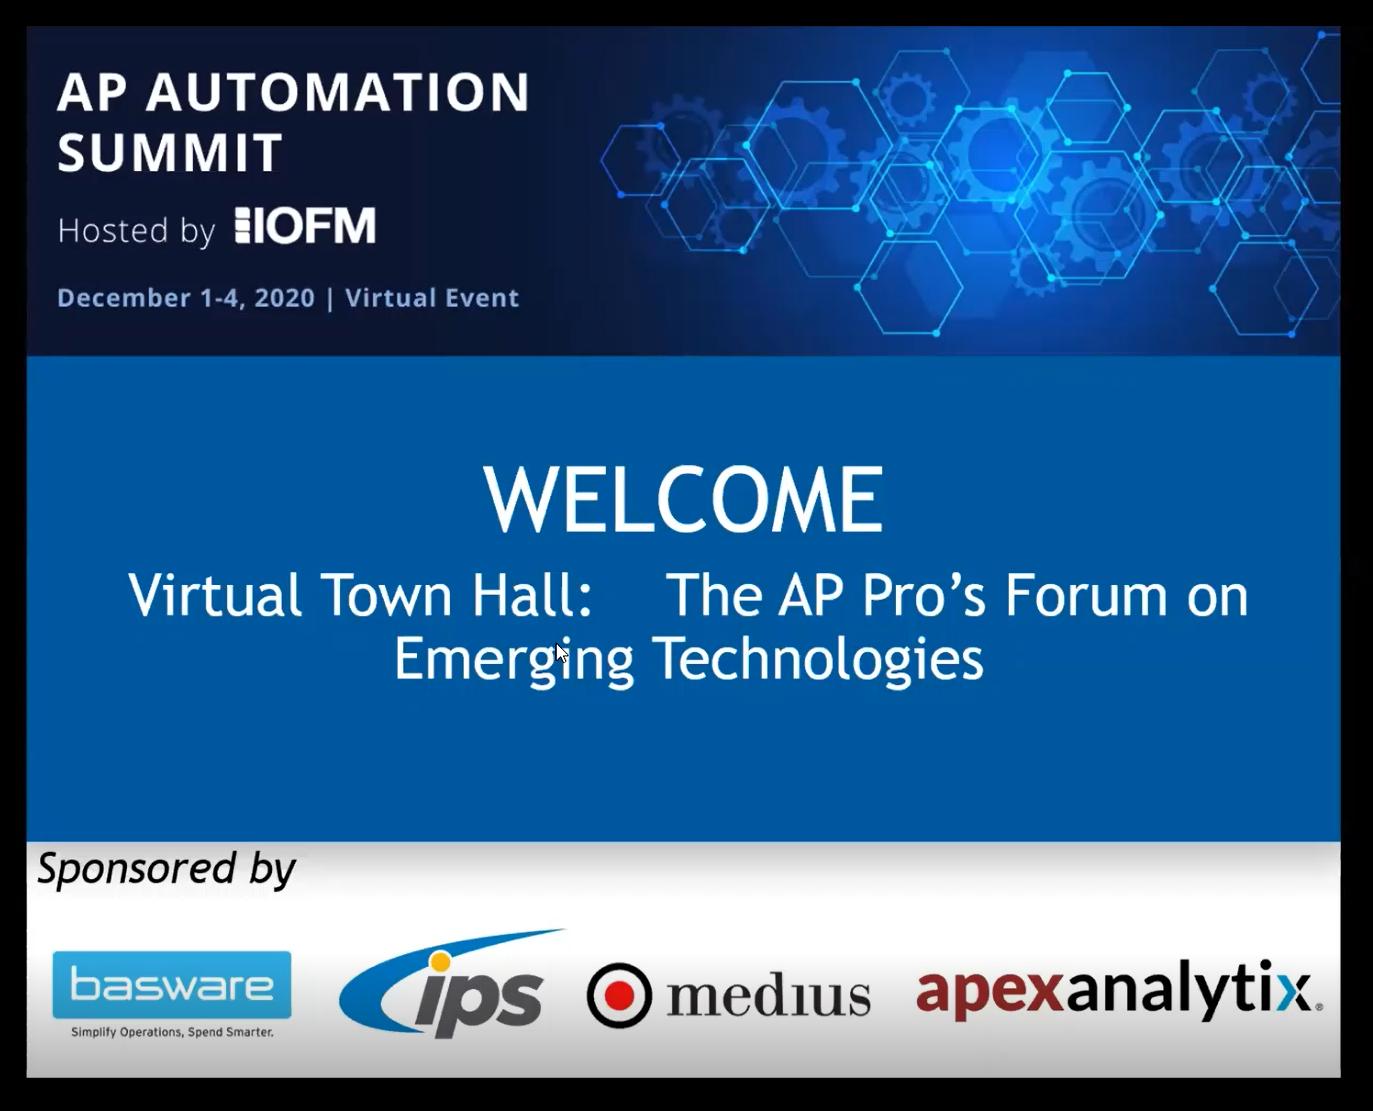 IOFM AP Automation Summit 2020 - Virtual Town Hall Meeting